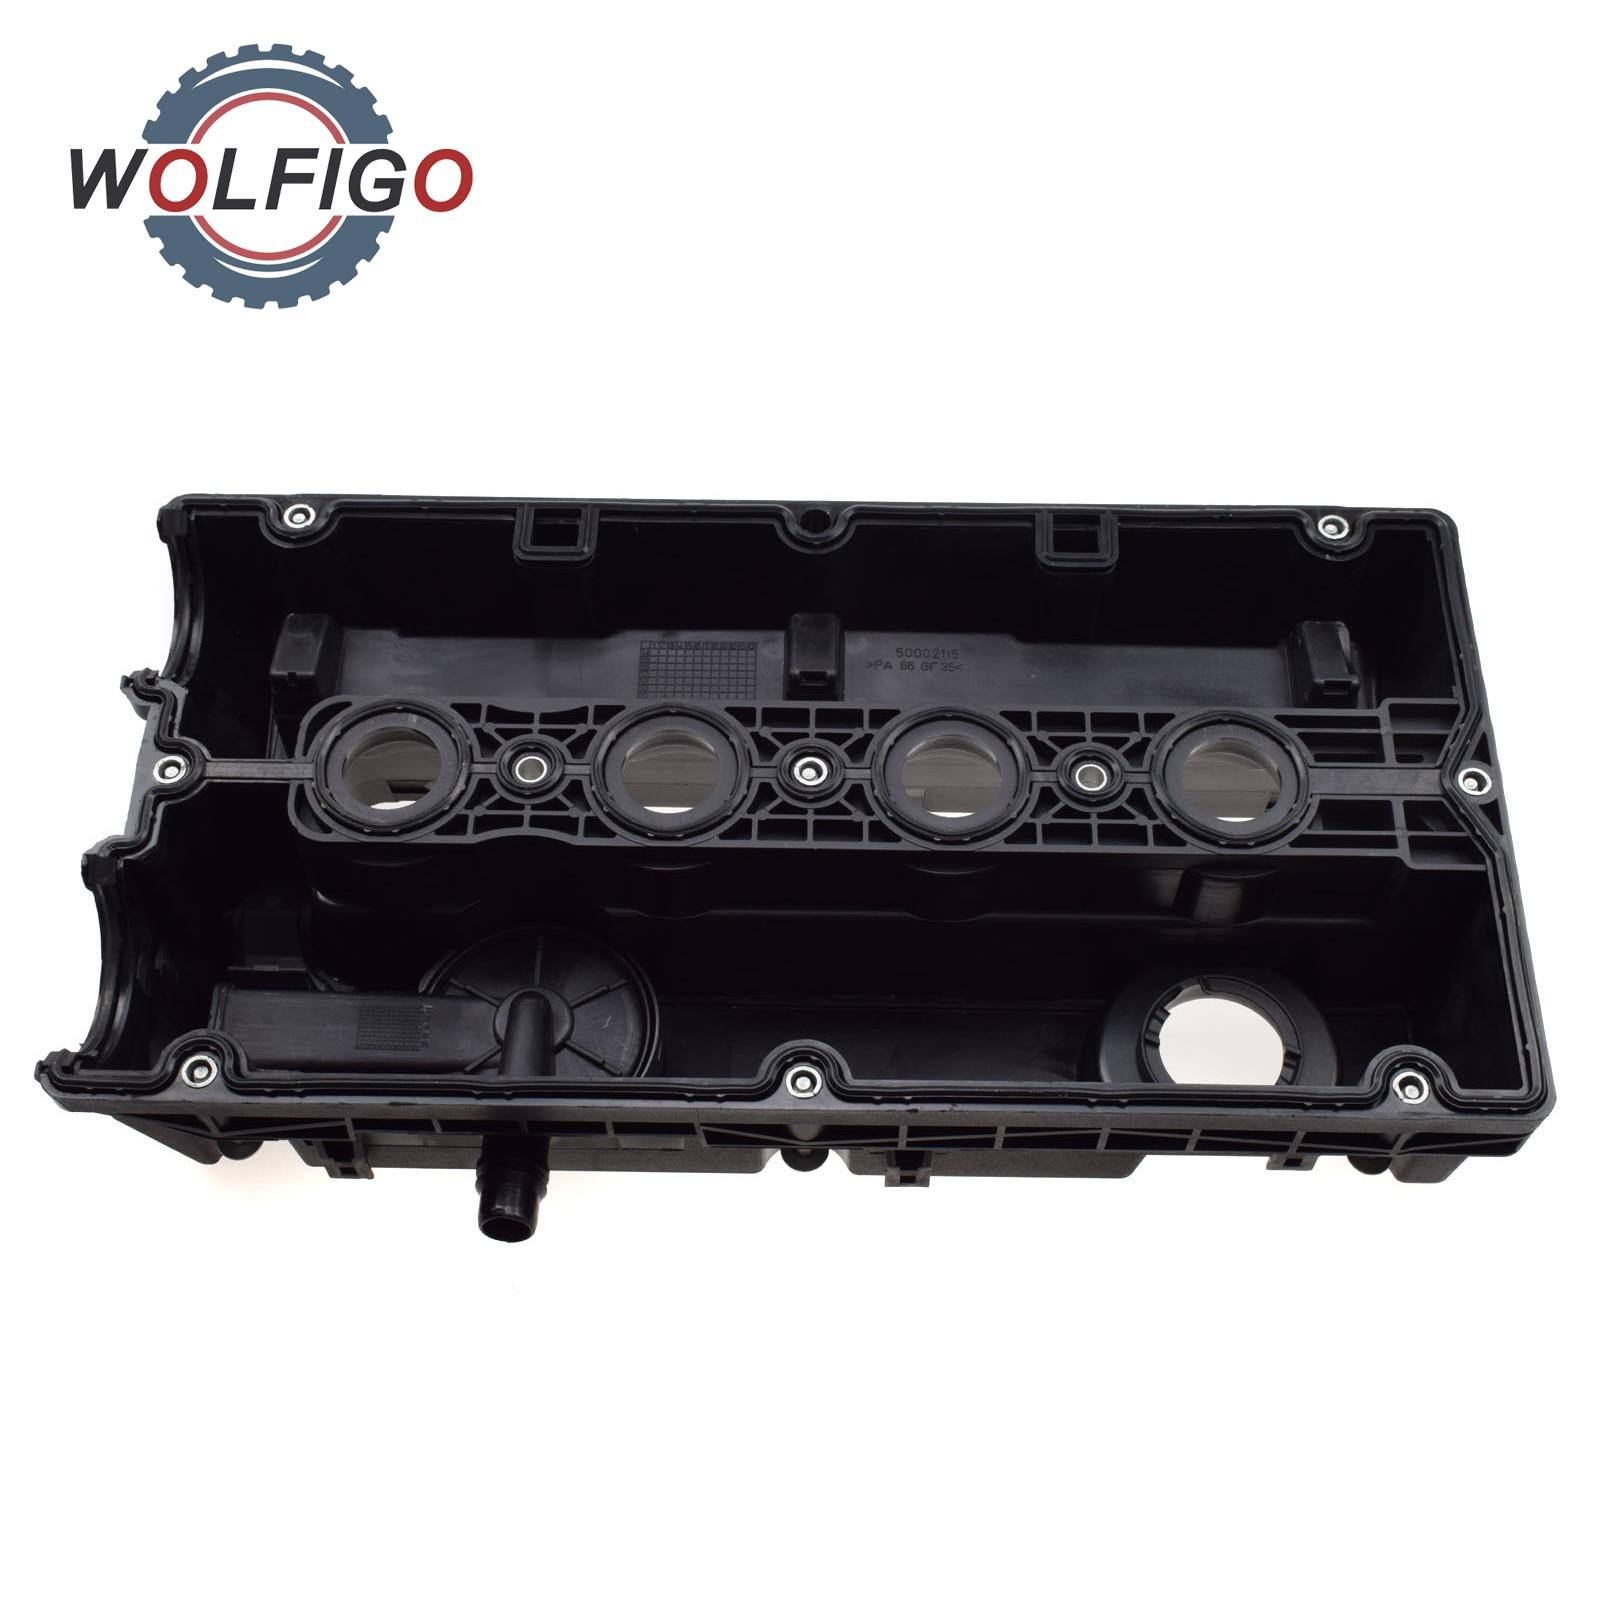 small resolution of wolfigo cam rocker engine valve cover z16xep 1 6l 55556284 5607159 for vauxhall astra g mk4